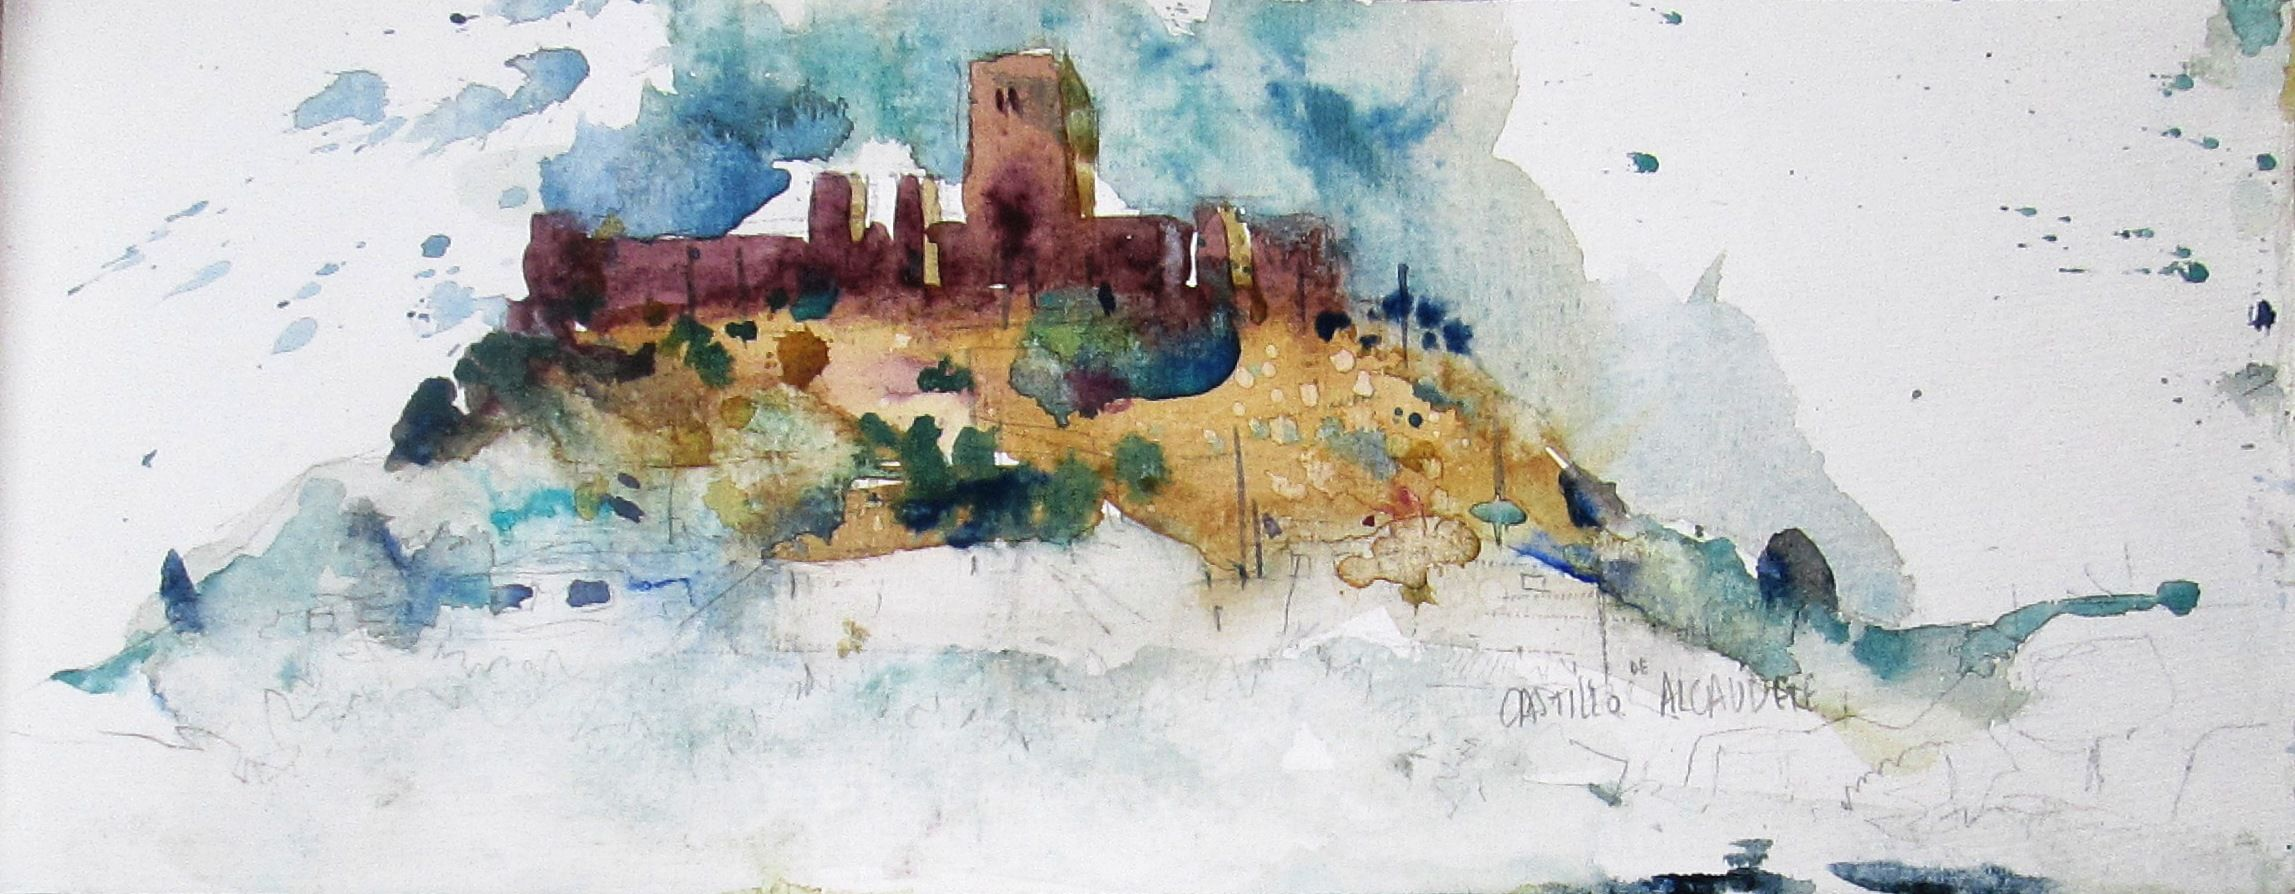 Castillo de Alcaudete Acuarela sobre papel Watercolor -  Aquarelle